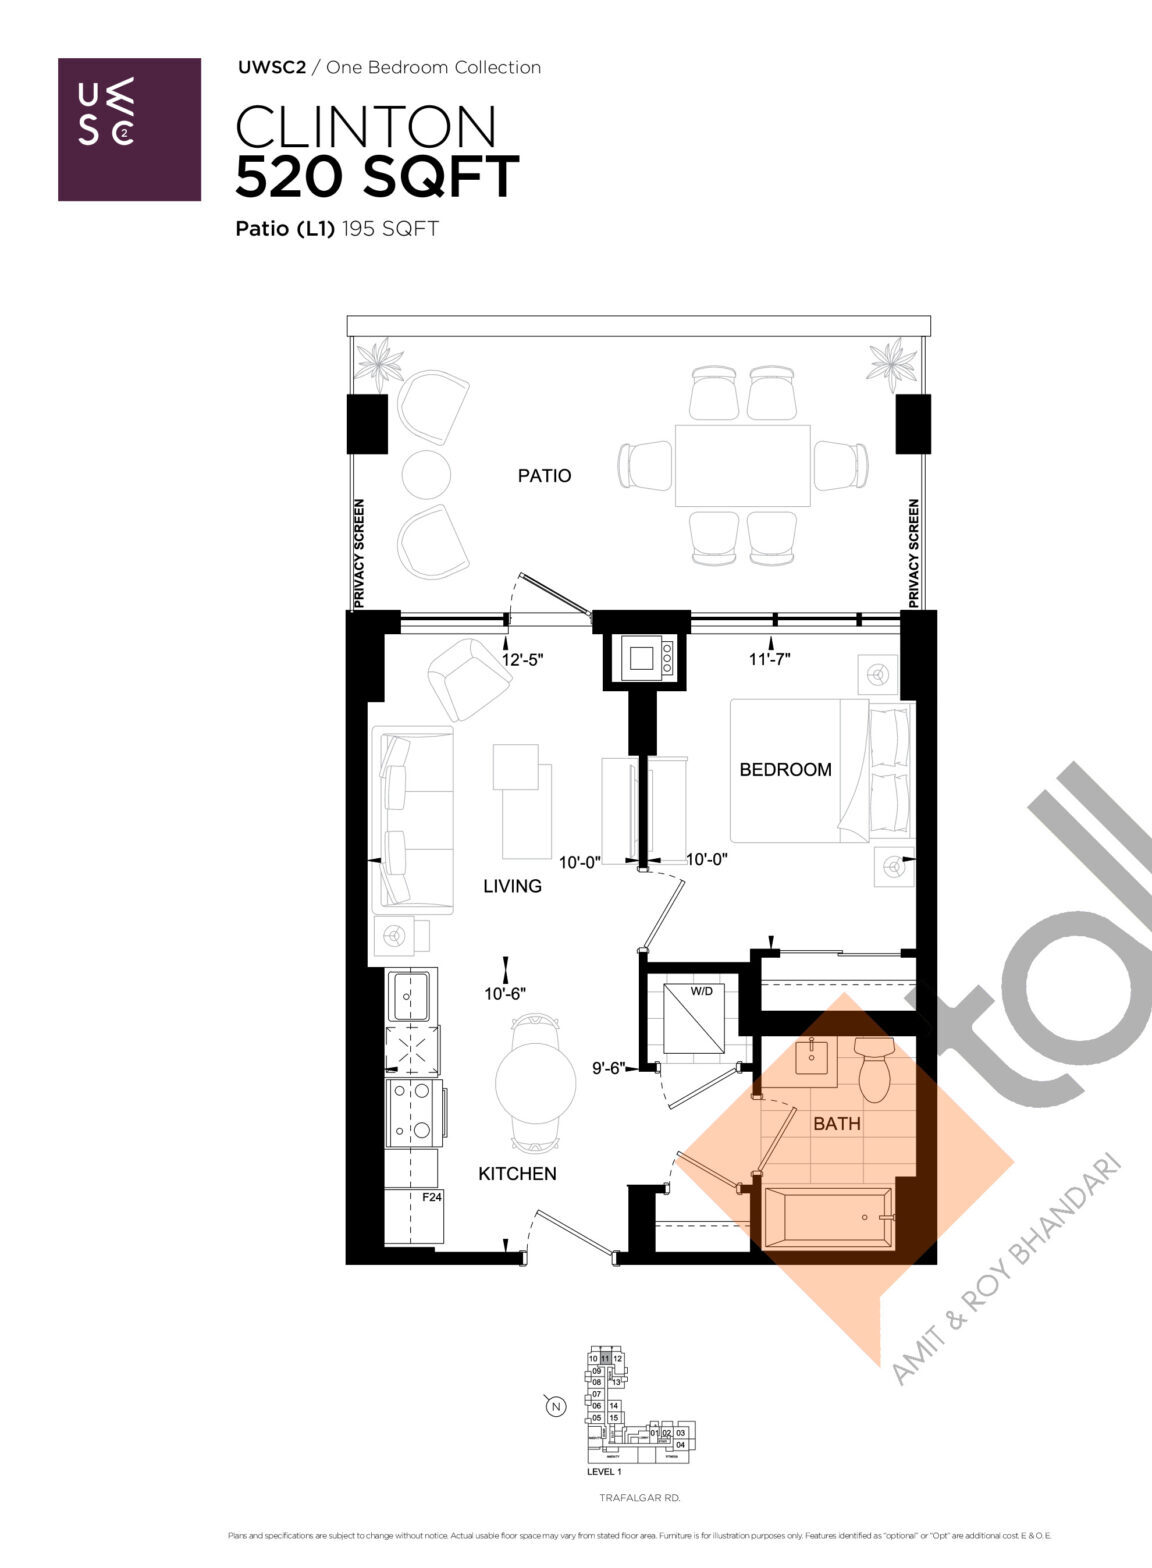 Clinton Floor Plan at Upper West Side Condos 2 - 520 sq.ft